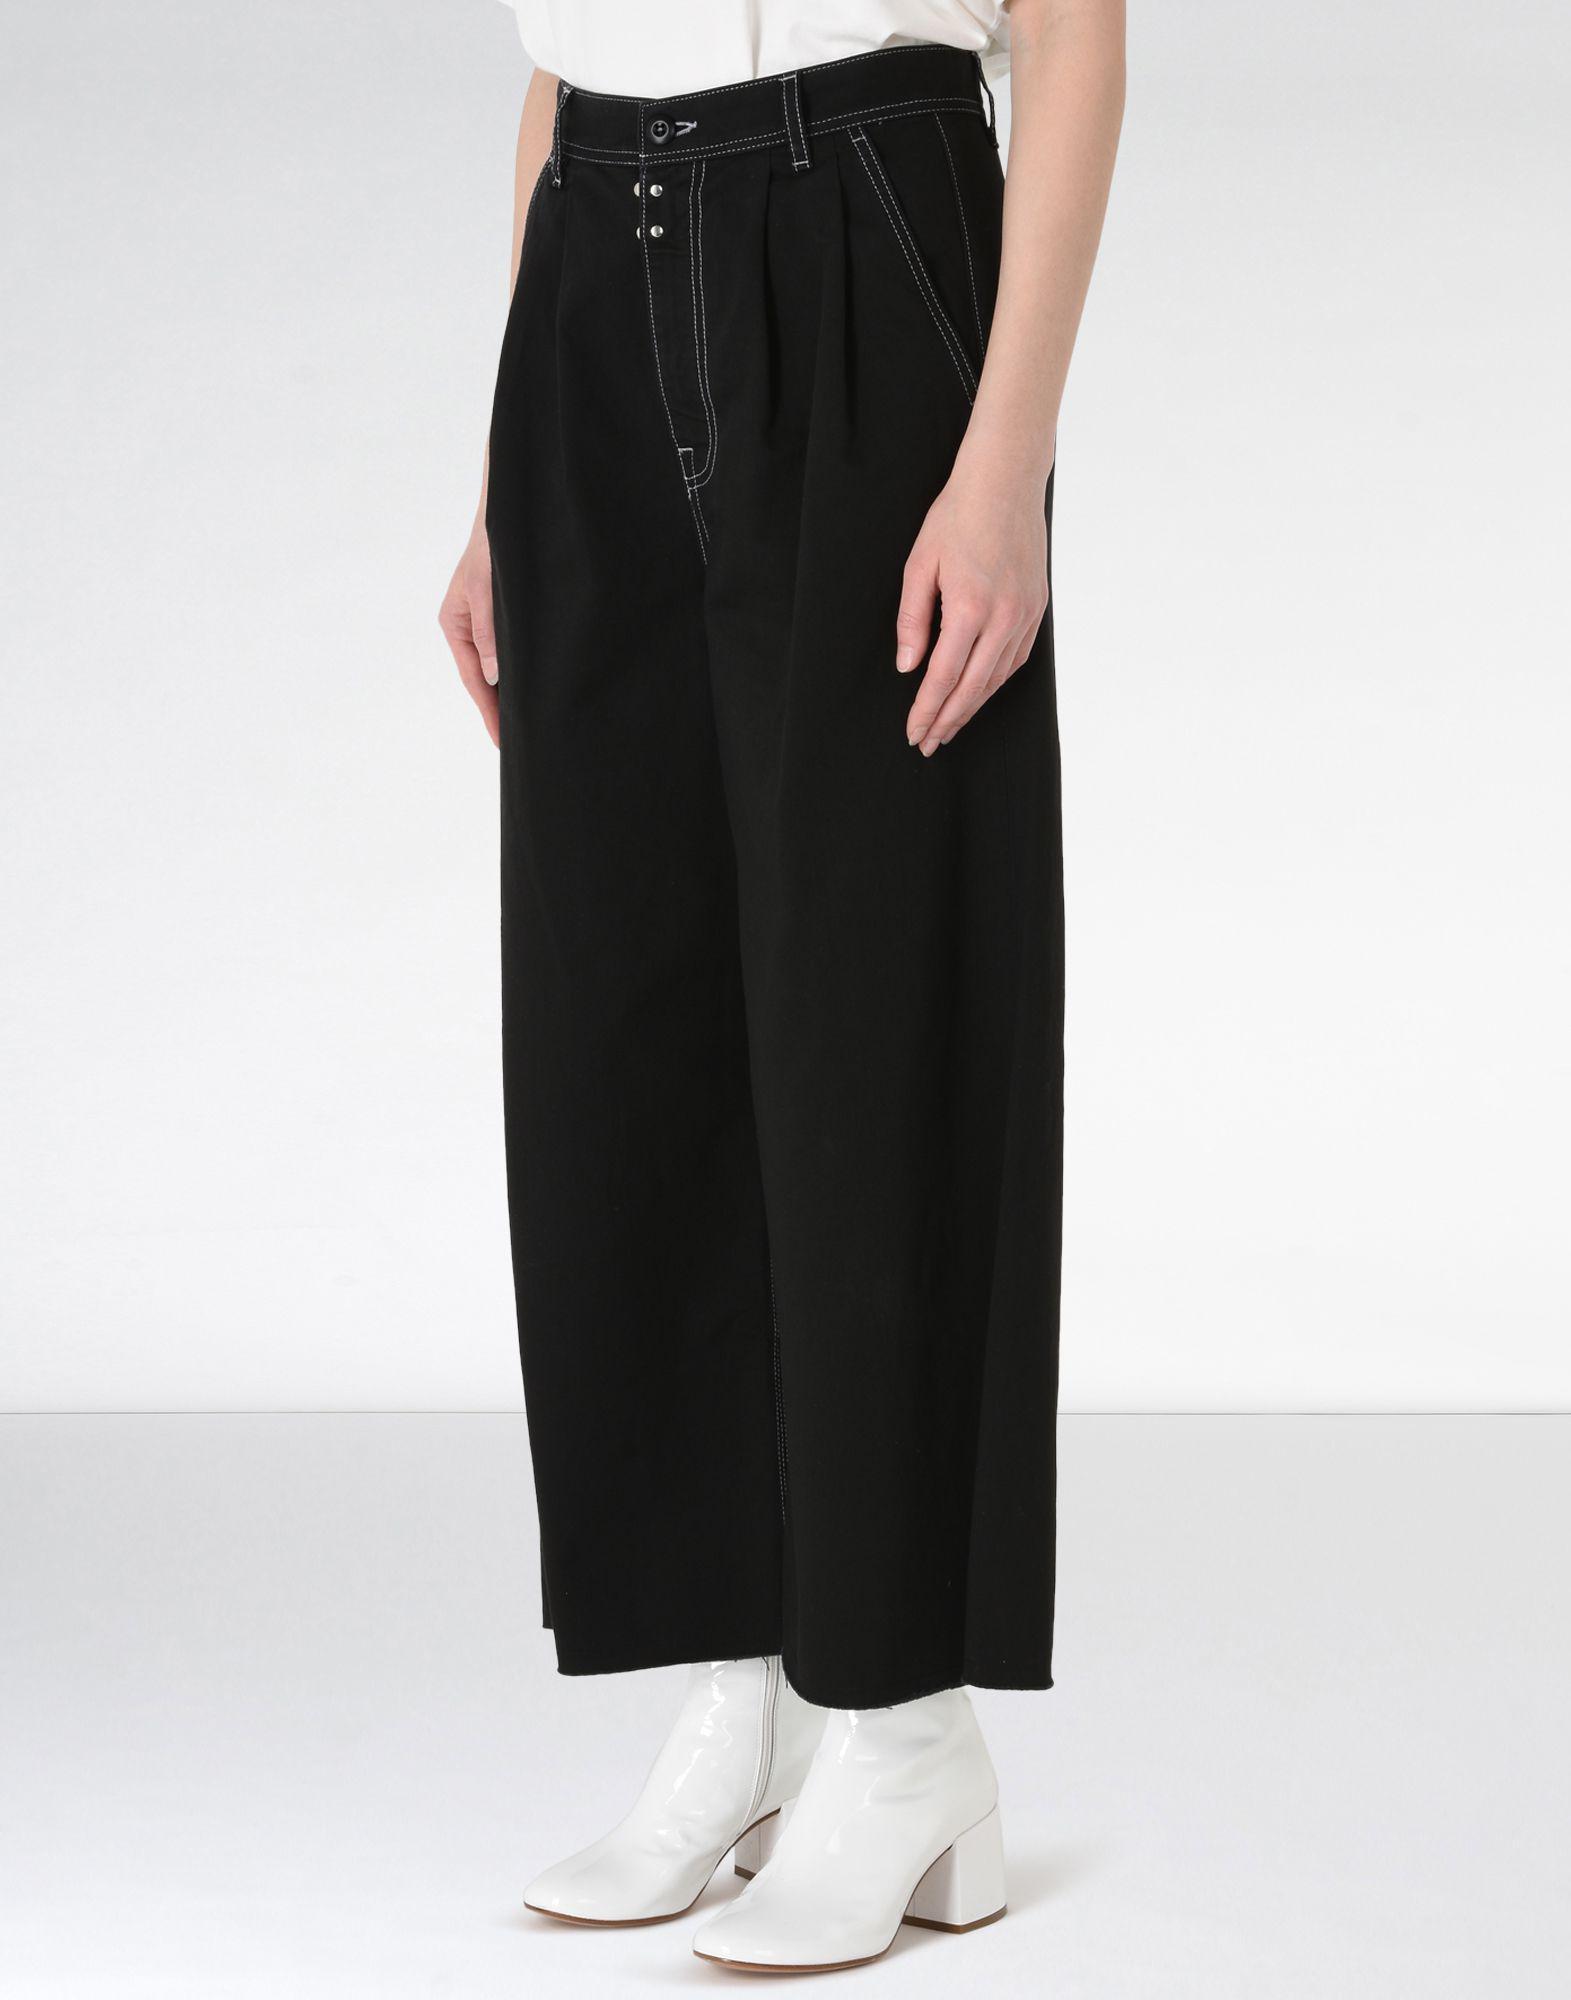 flared trousers - Black Maison Martin Margiela naZWPr